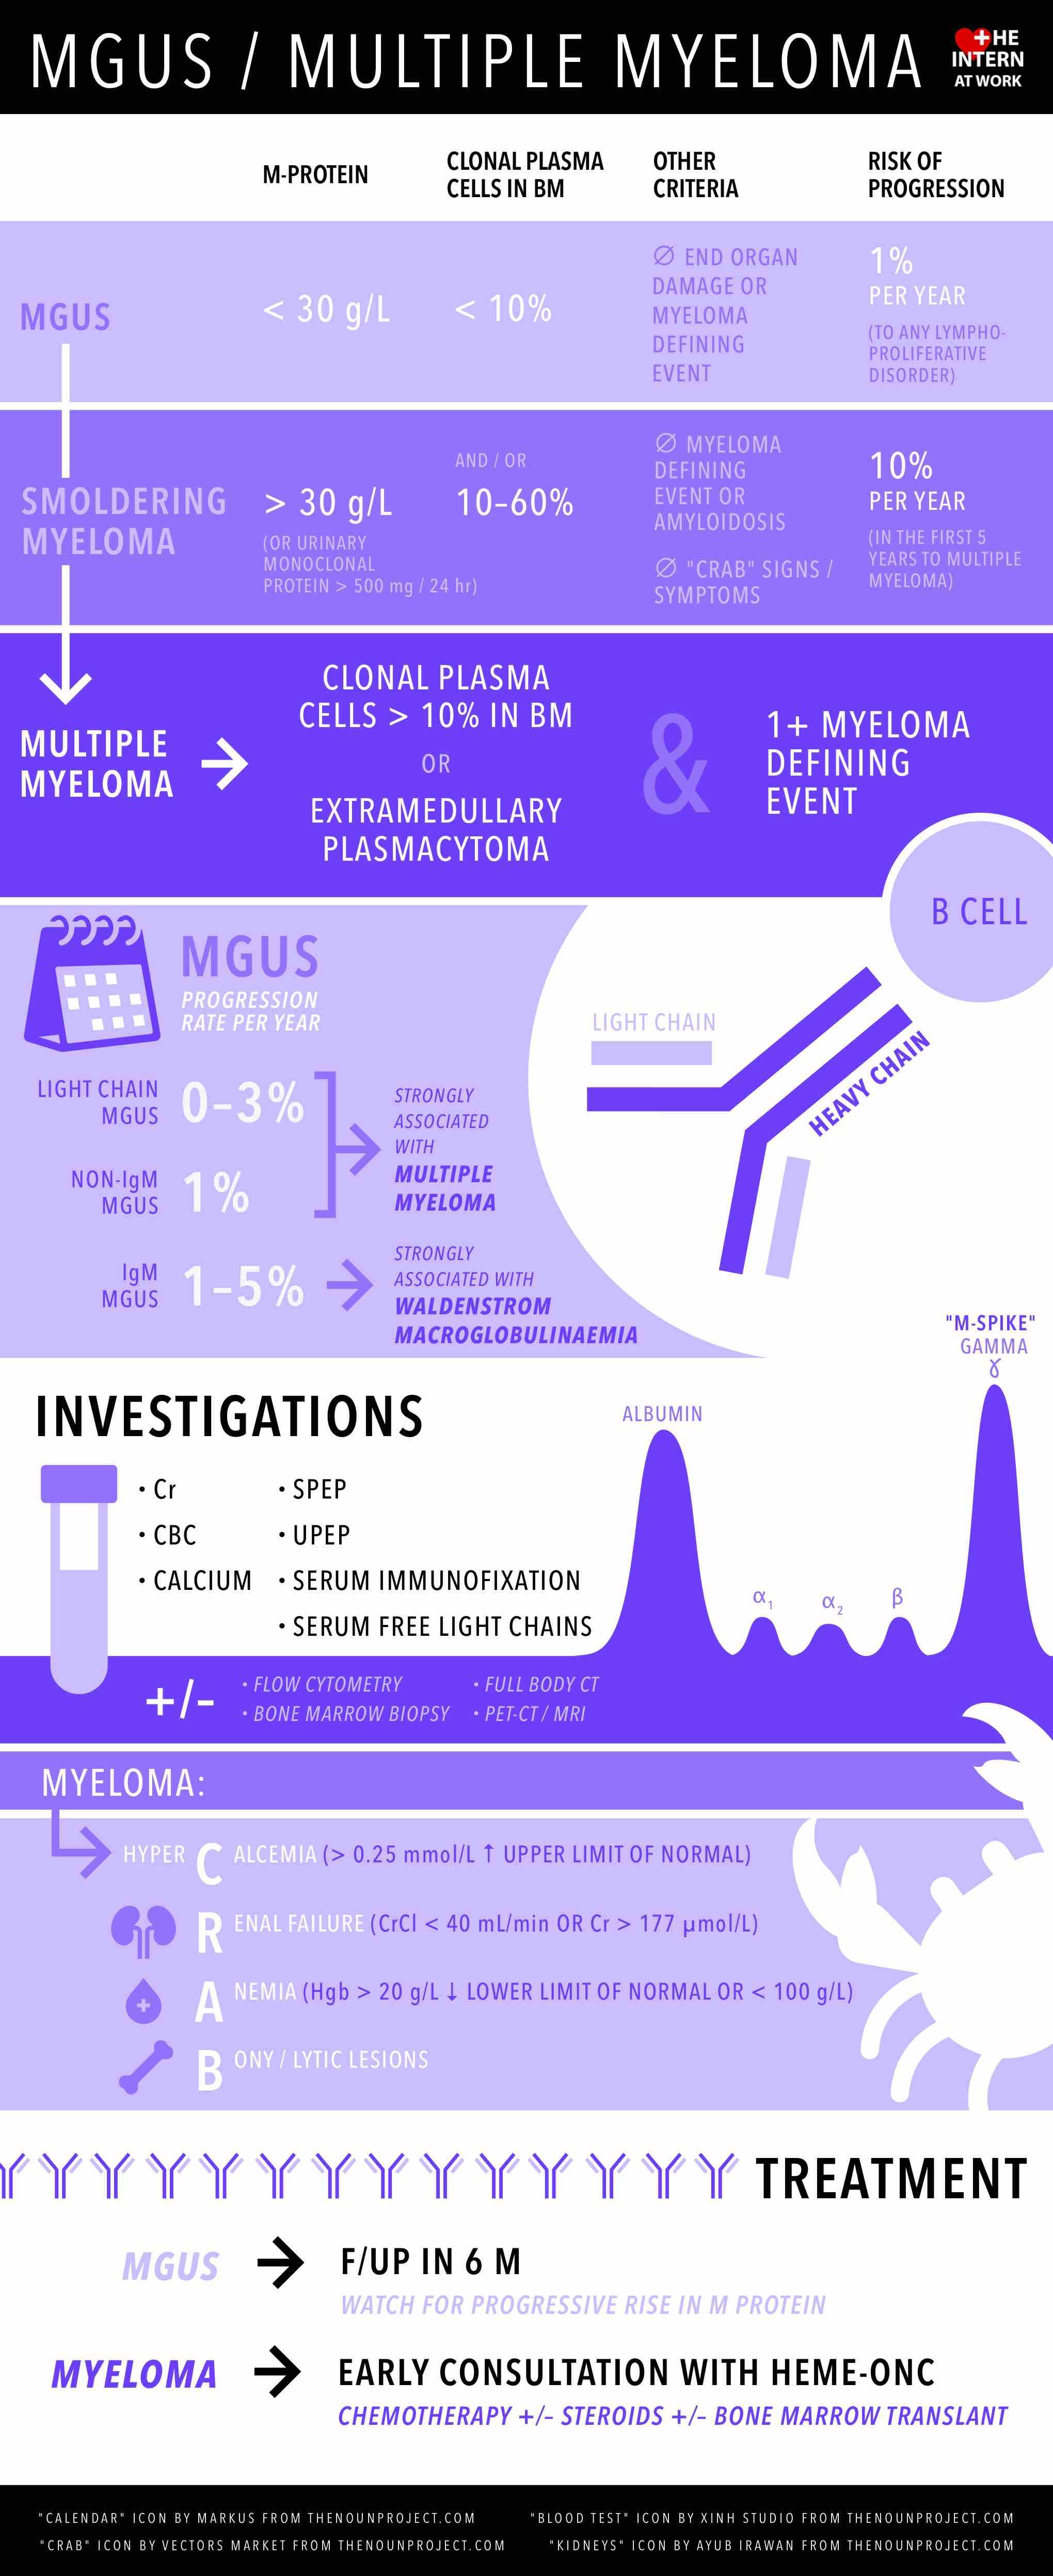 MGUS Multiple Myeloma.jpg